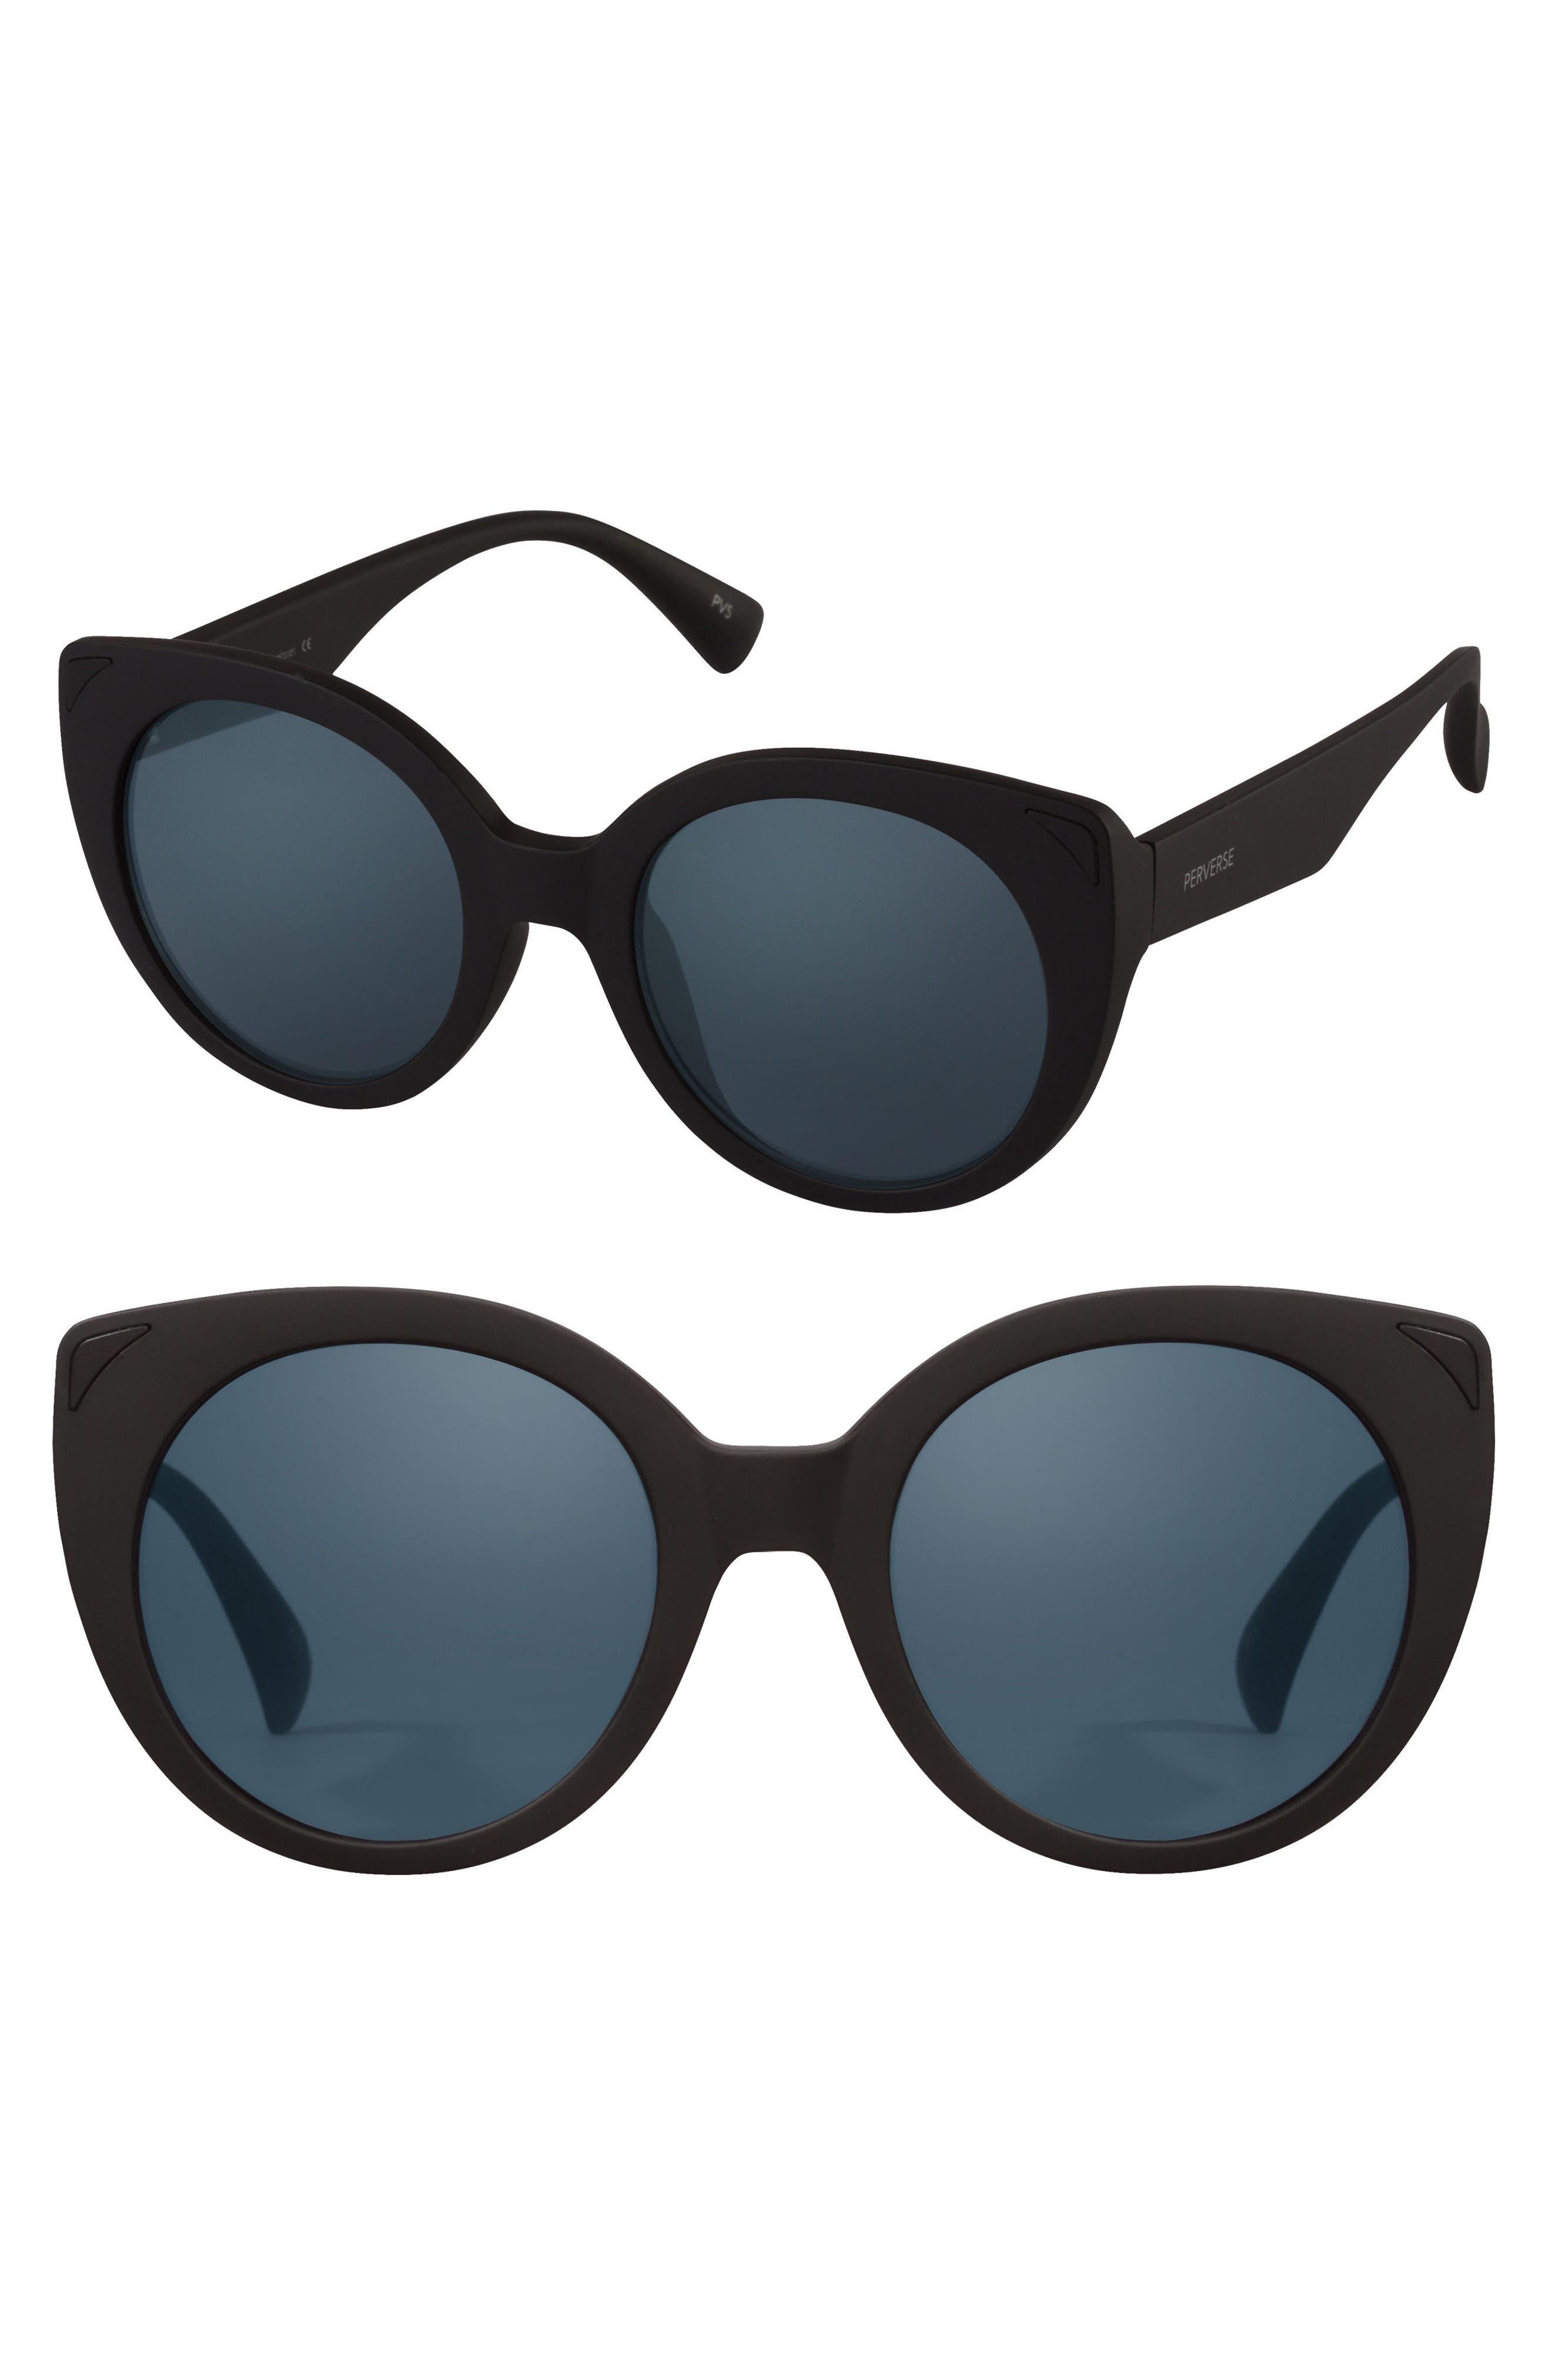 49mm Feline Round Cat Eye Sunglasses,                             Main thumbnail 1, color,                             001